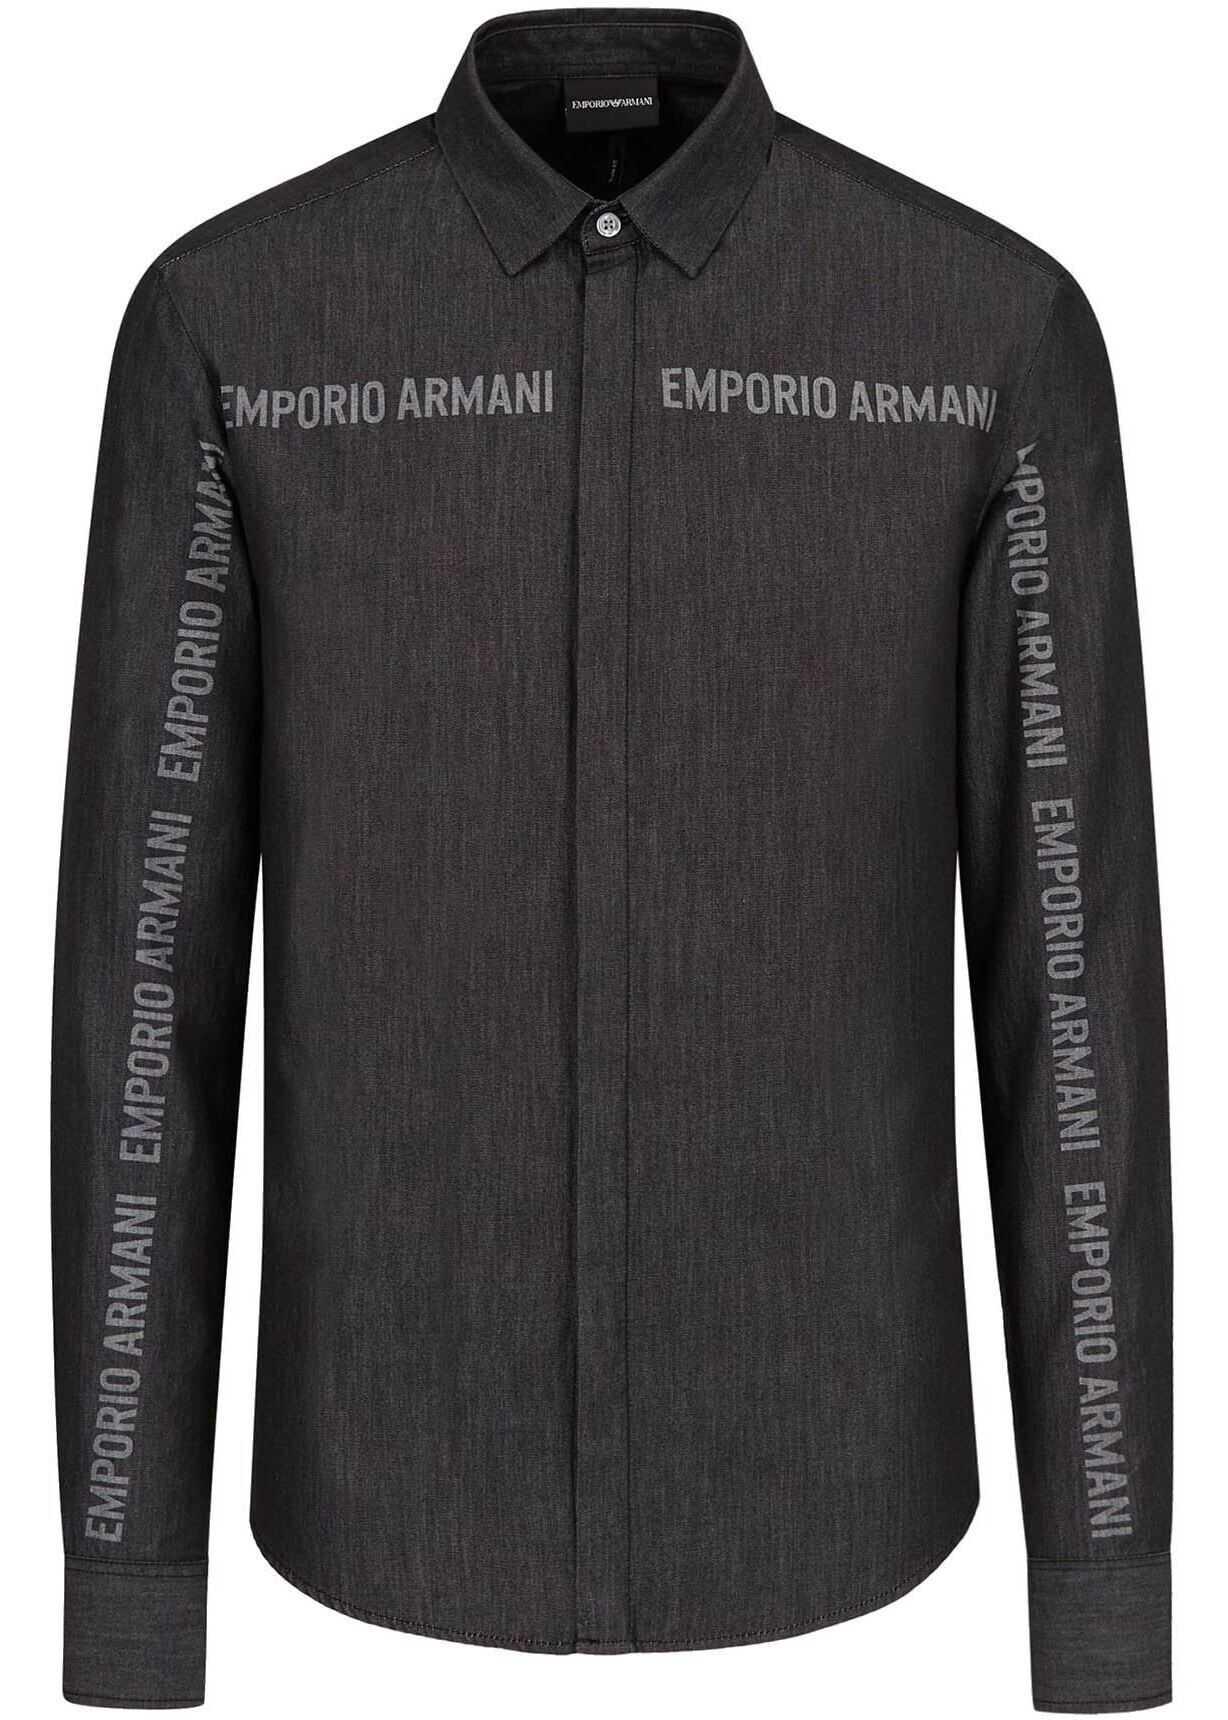 Emporio Armani Branded Shirt In Dark Grey Grey imagine